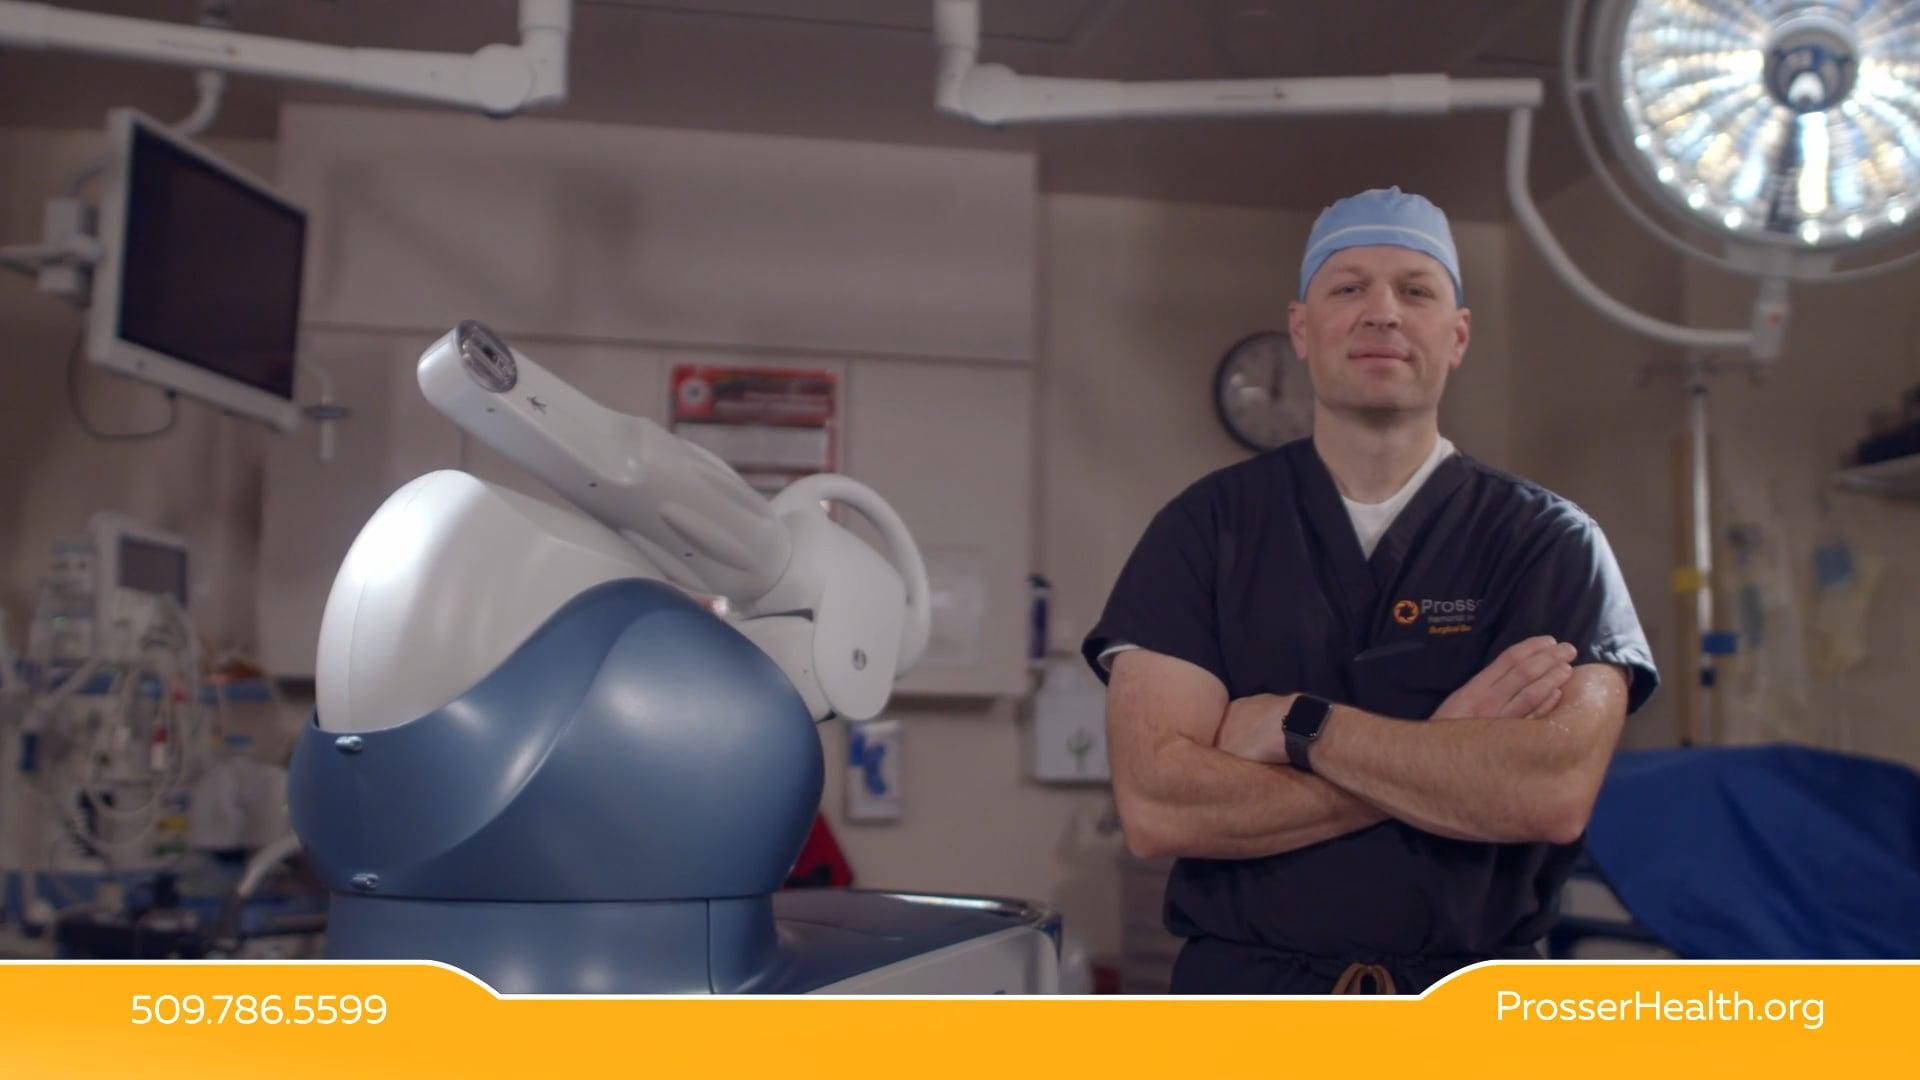 Dr. Sam Strebel